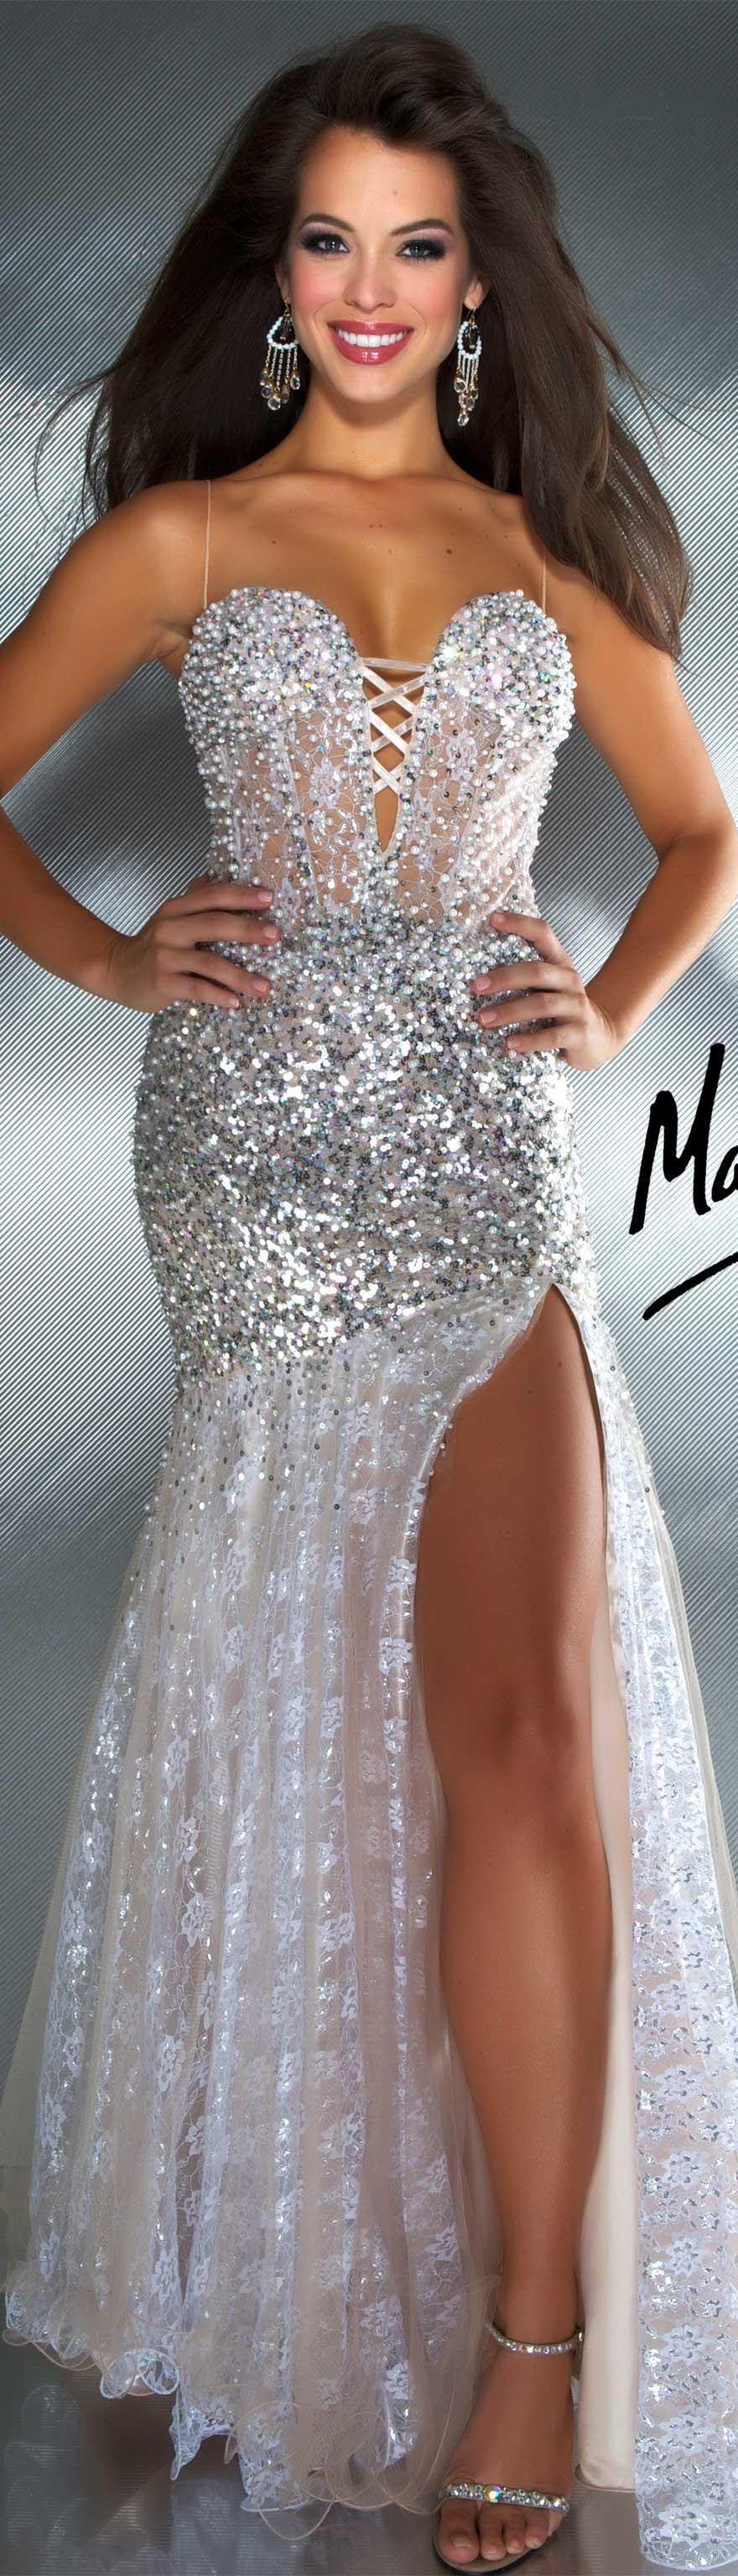 Mac duggal couture dress ivory nude long formal dress glitter